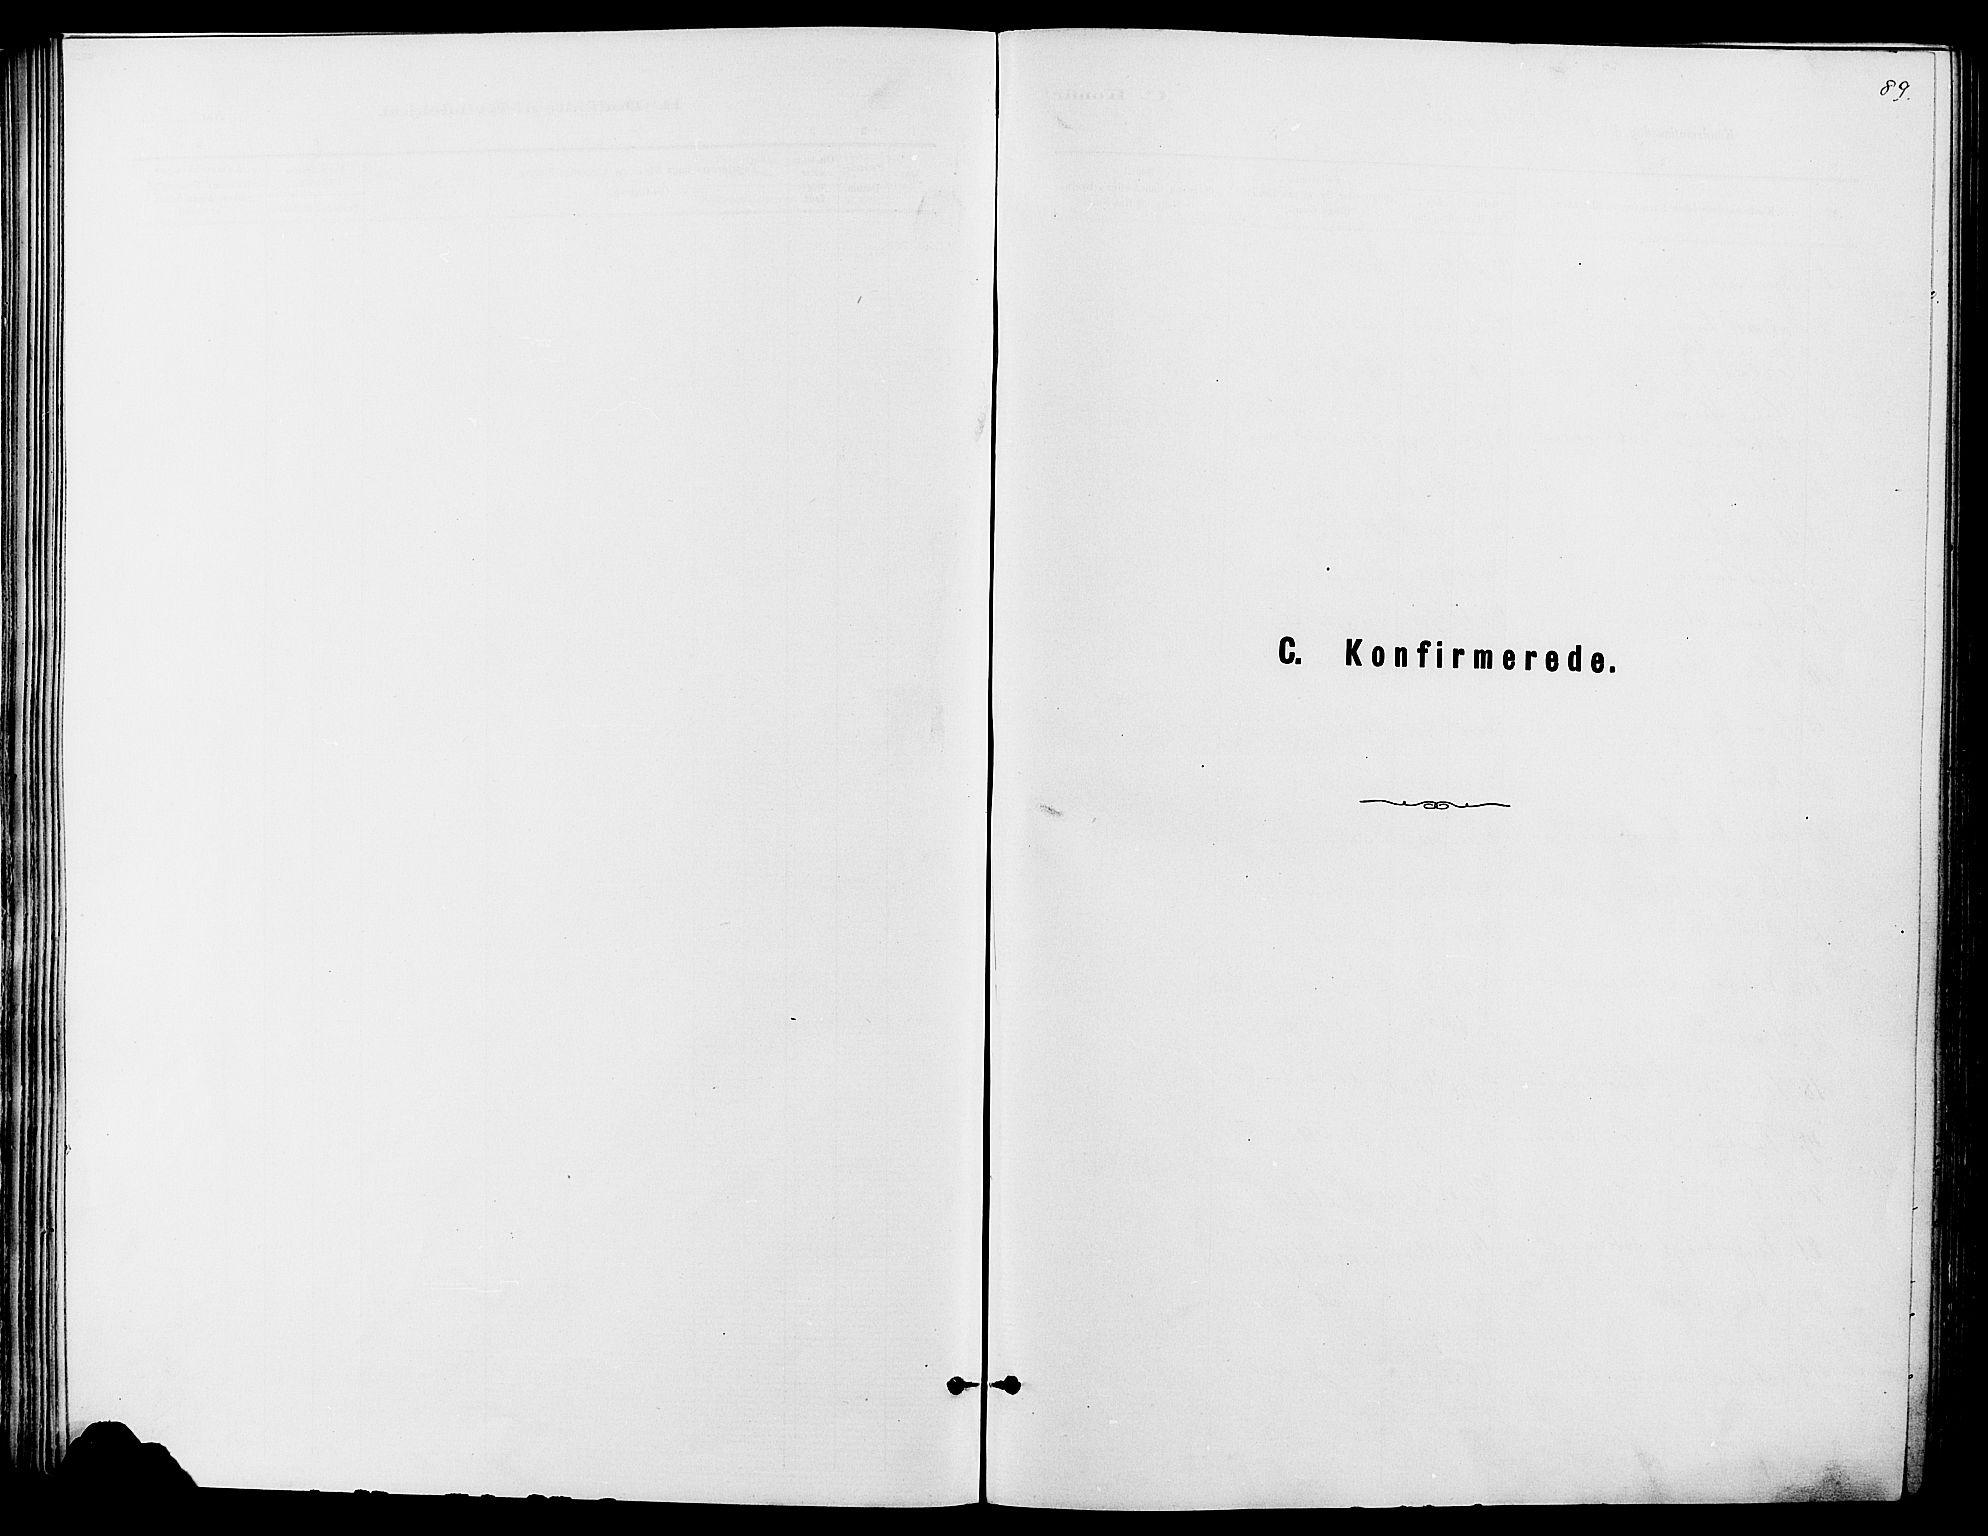 SAH, Dovre prestekontor, Ministerialbok nr. 2, 1879-1890, s. 89